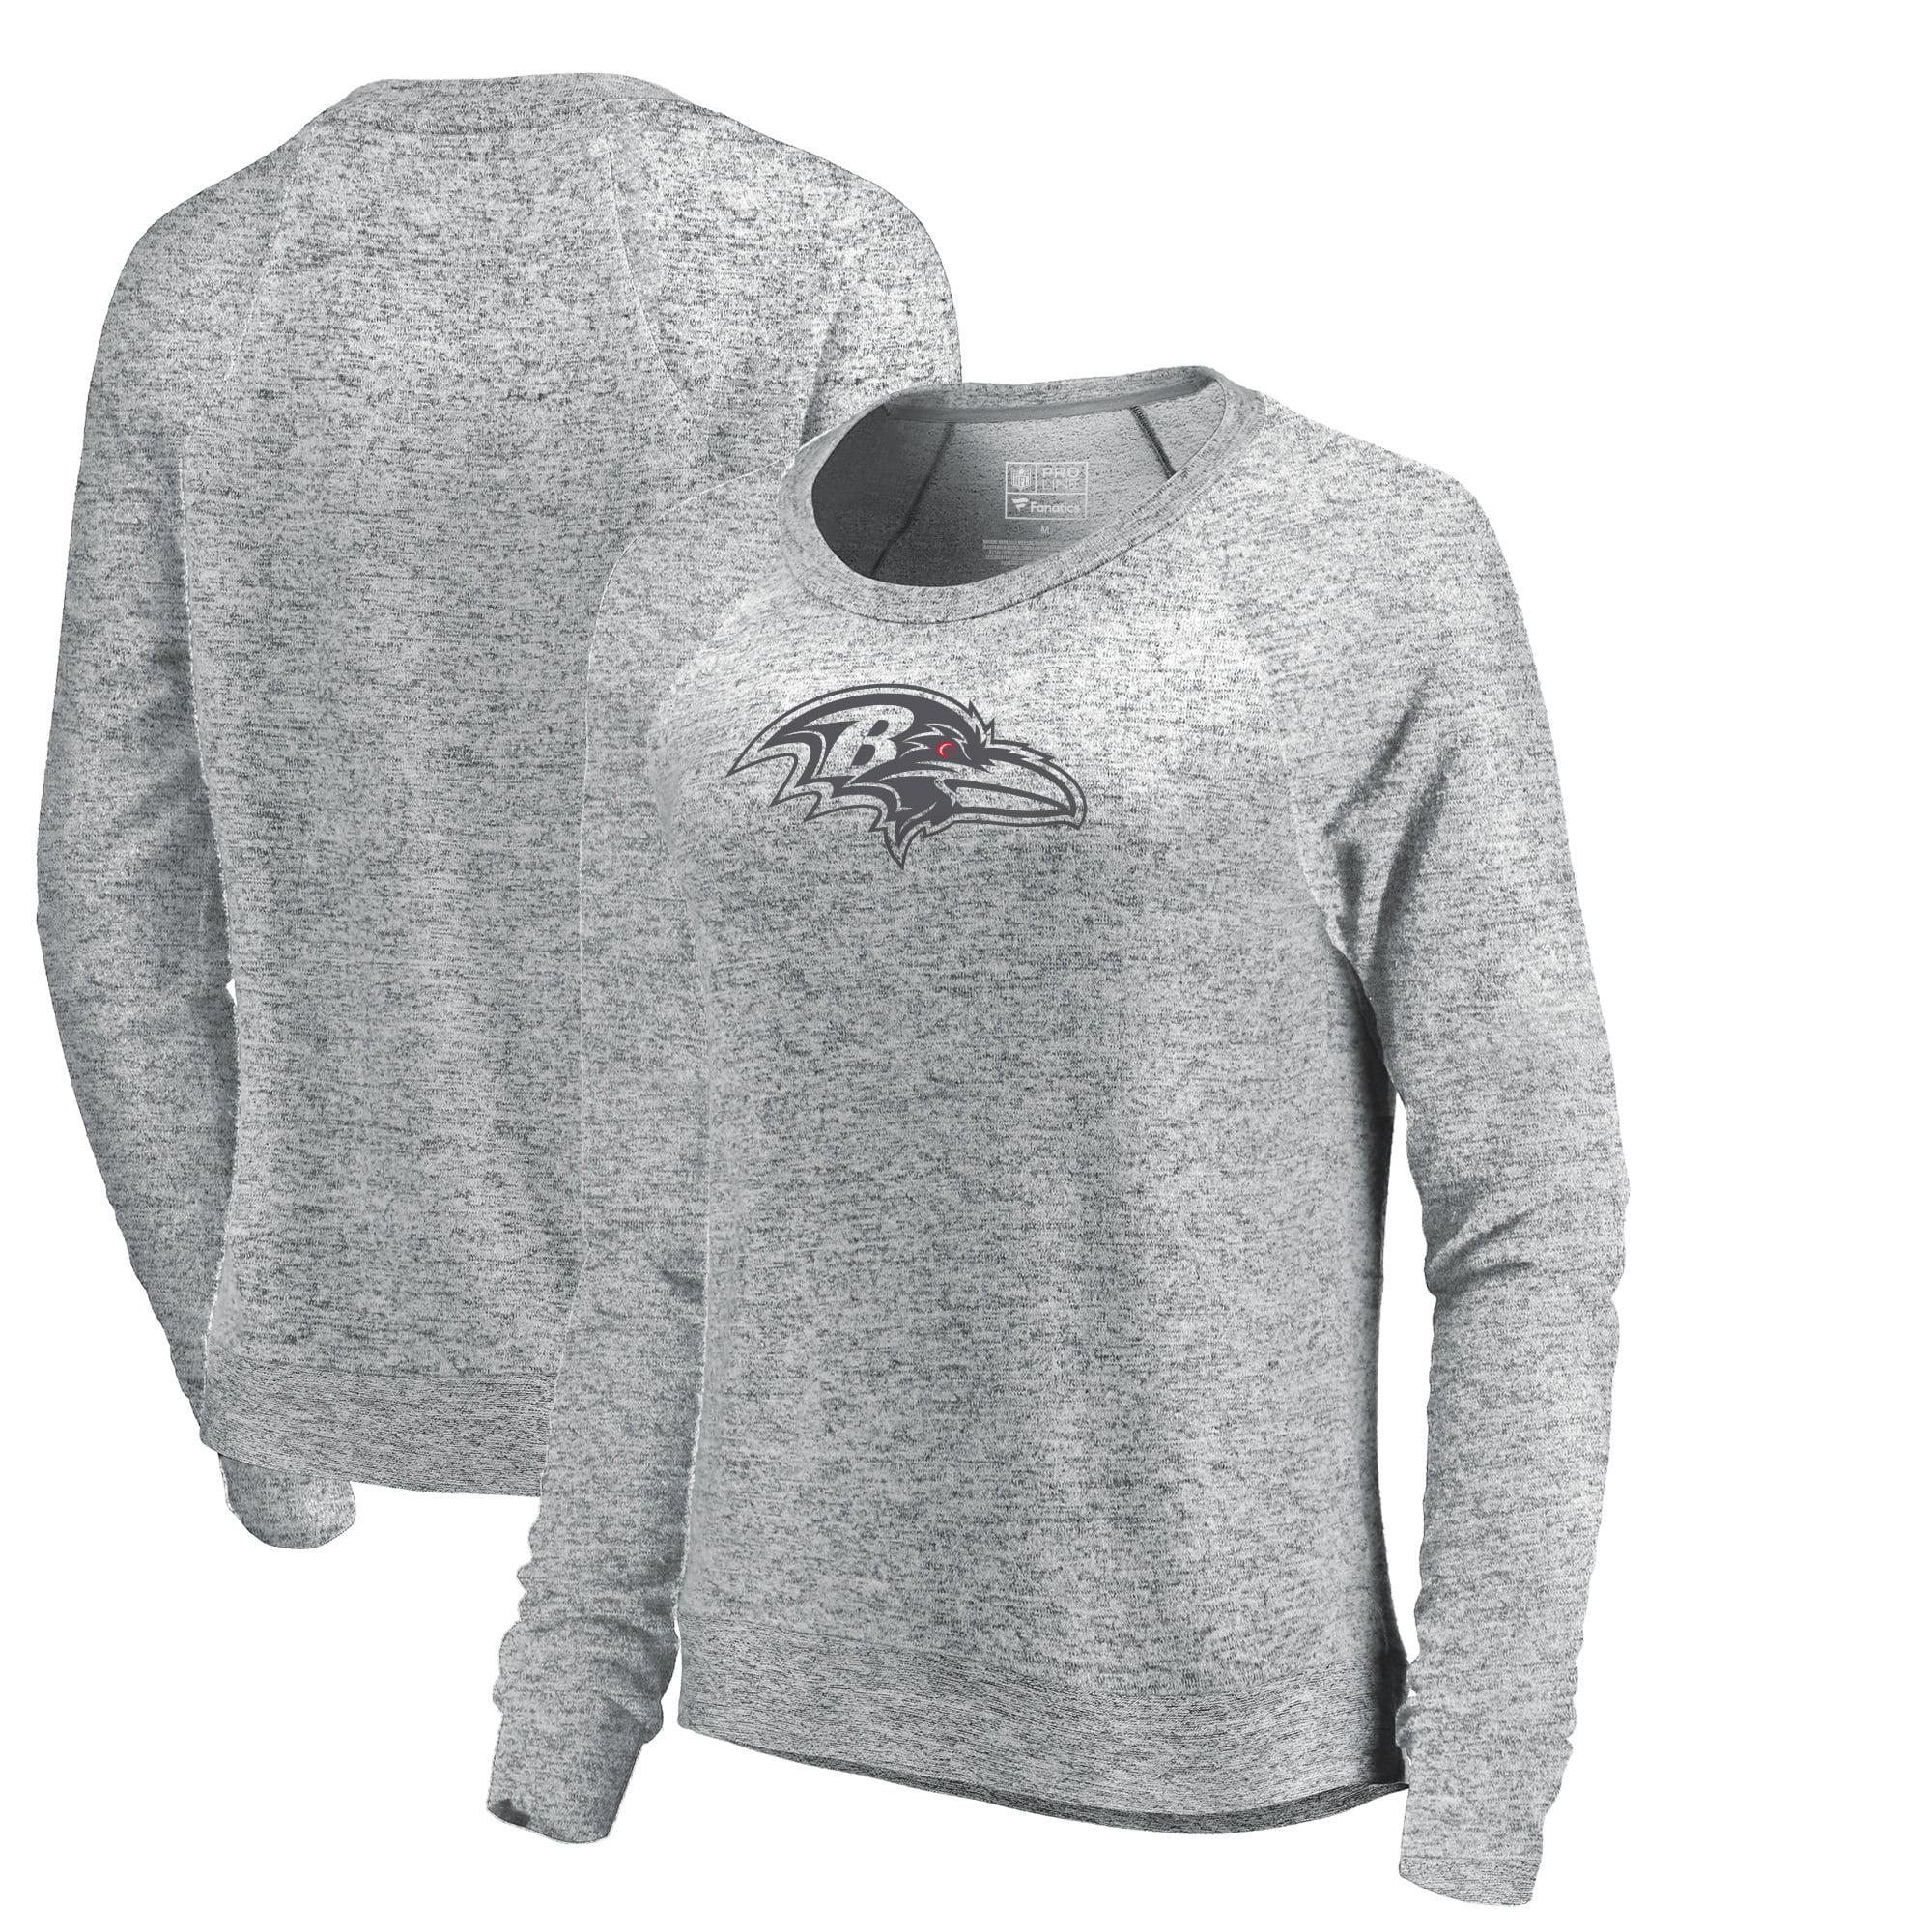 Baltimore Ravens NFL Pro Line by Fanatics Branded Women's Cozy Collection Plush Crew Sweatshirt - Ash